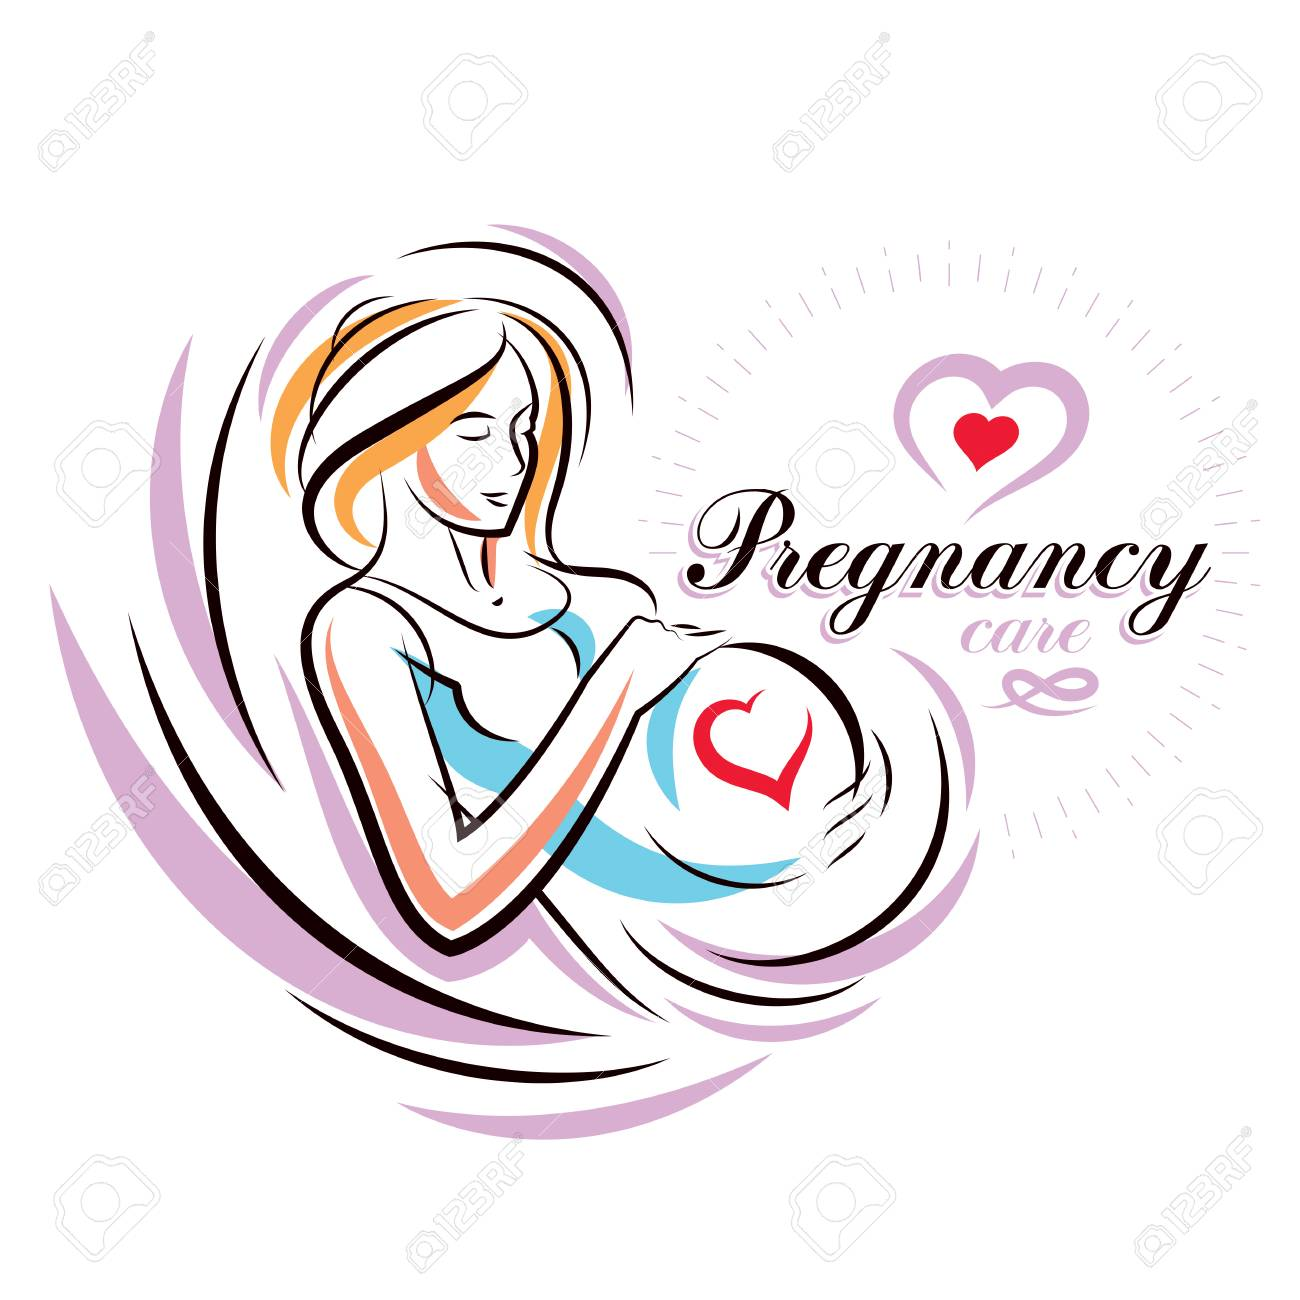 727faa6e3aead Pregnant Female Body Shape Hand Drawn Vector Illustration